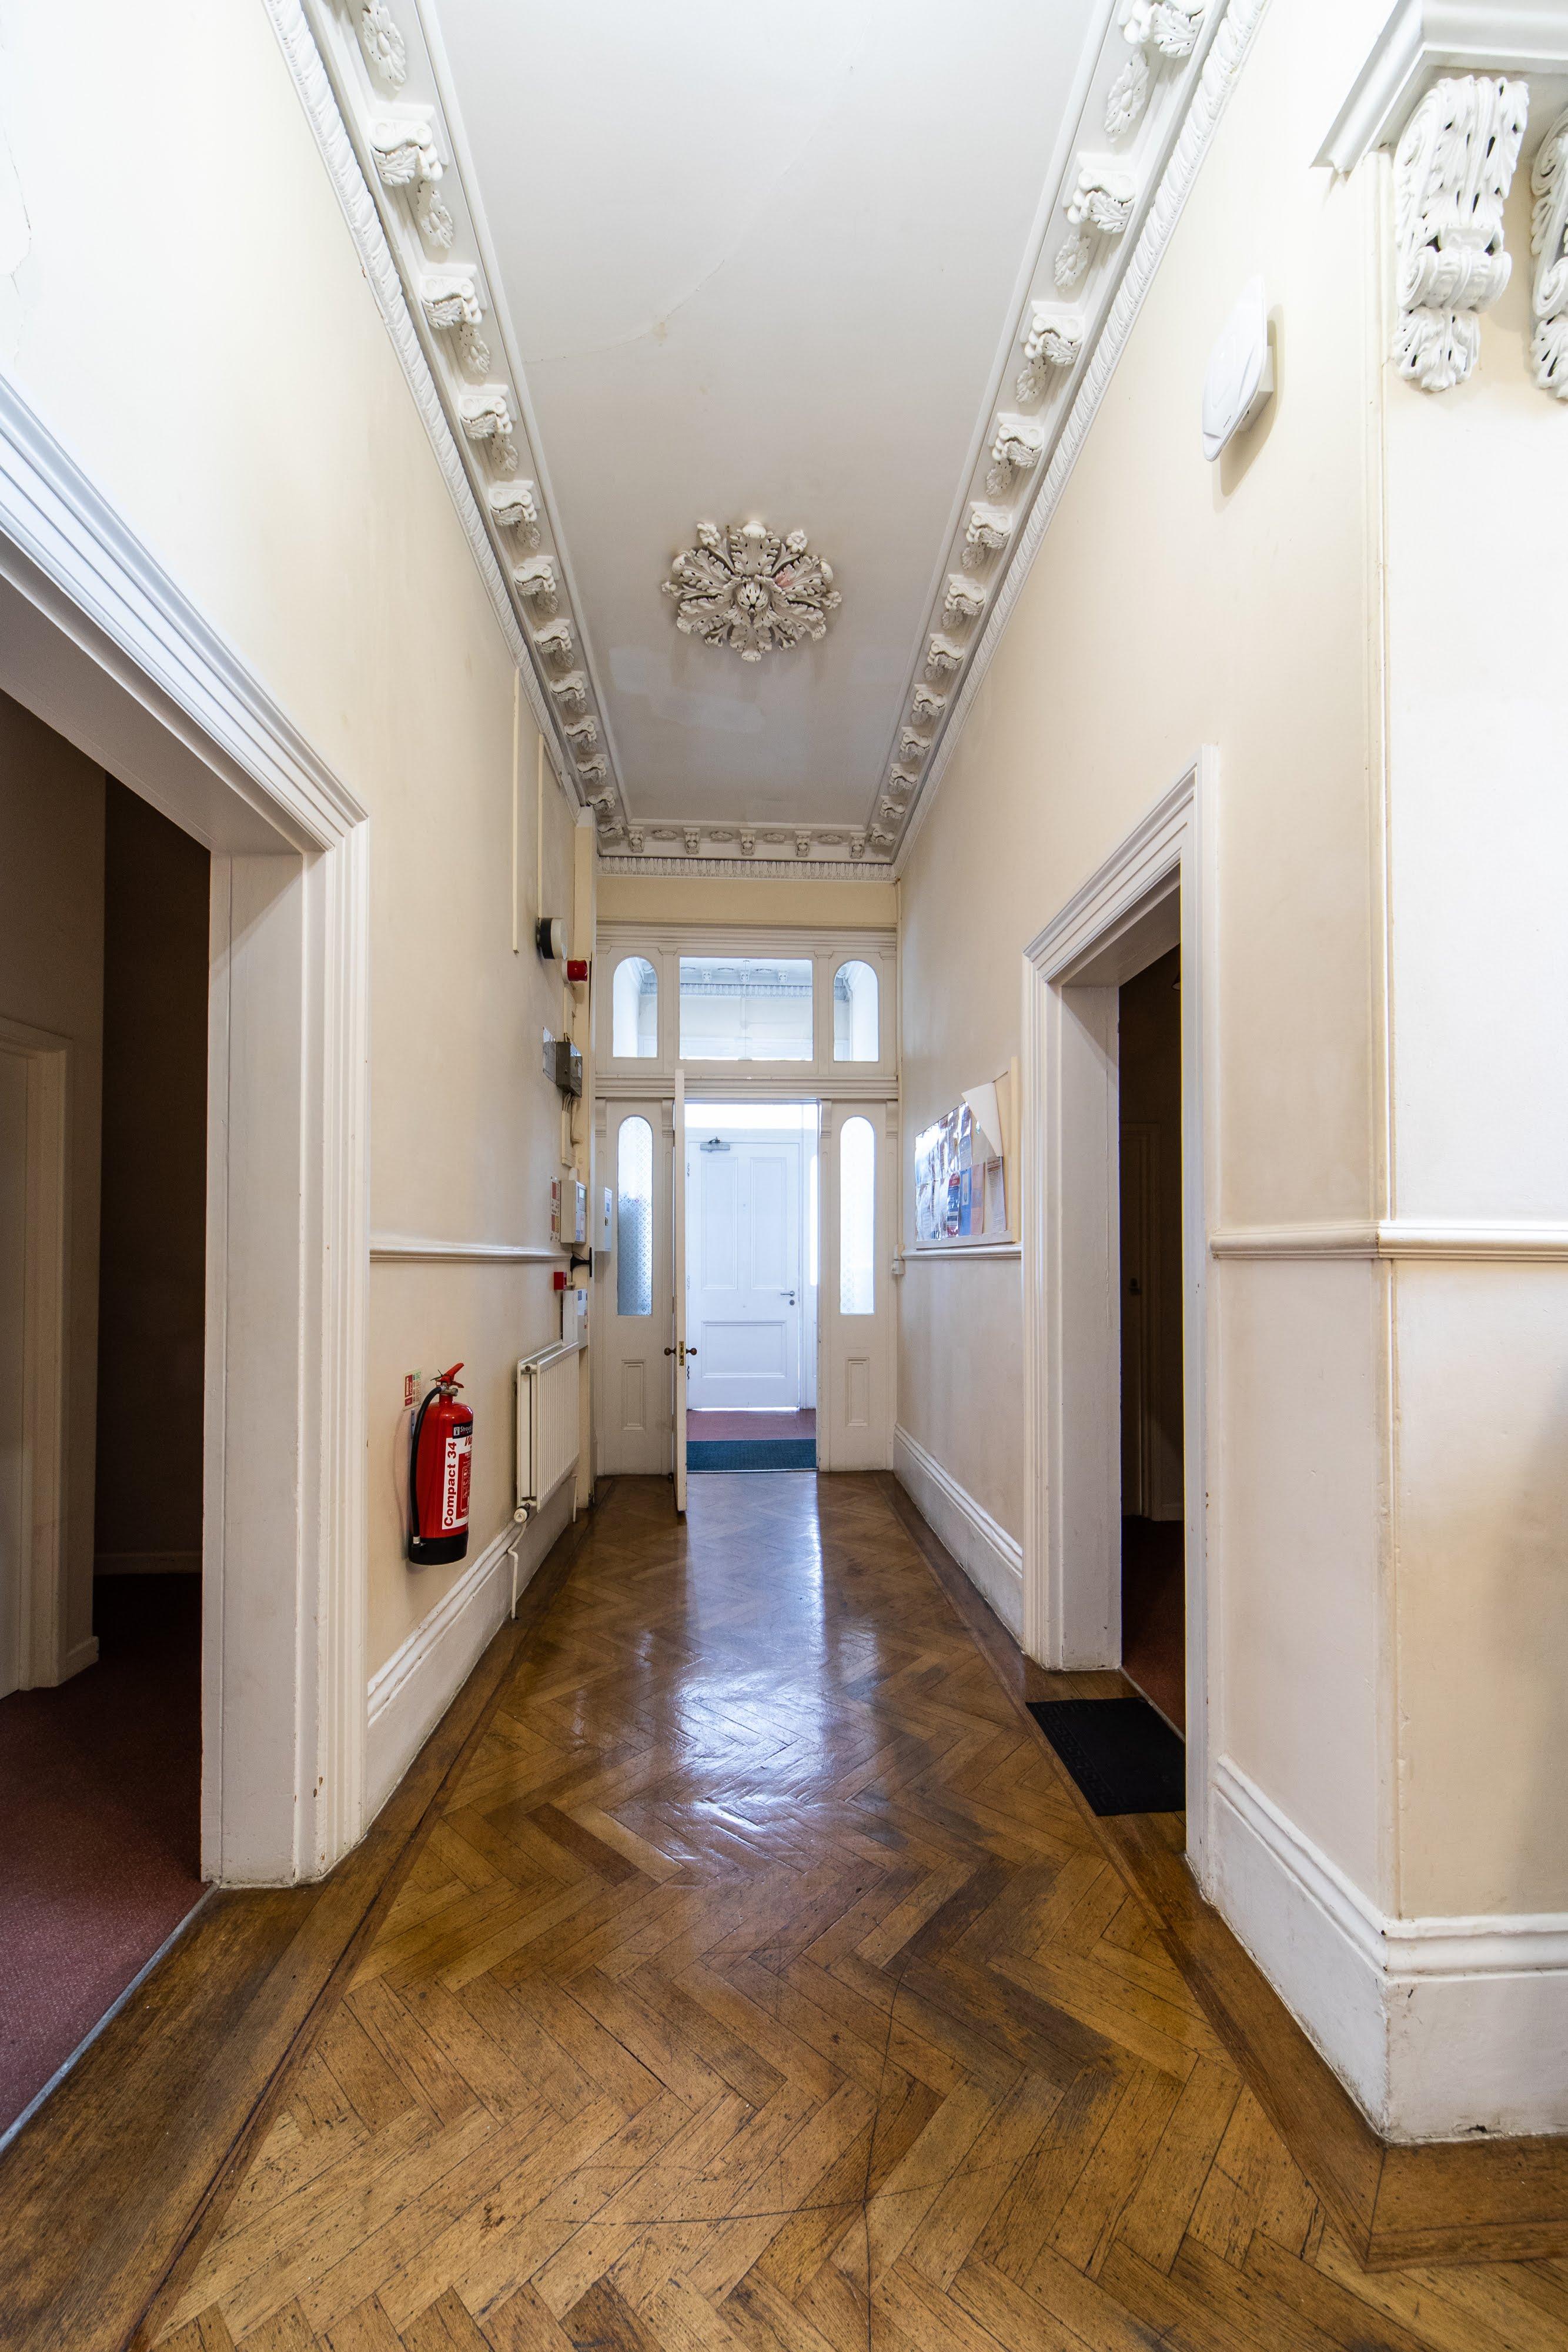 Land Cheltenham, GL20 2JA - Eildon & Merrowdown Halls